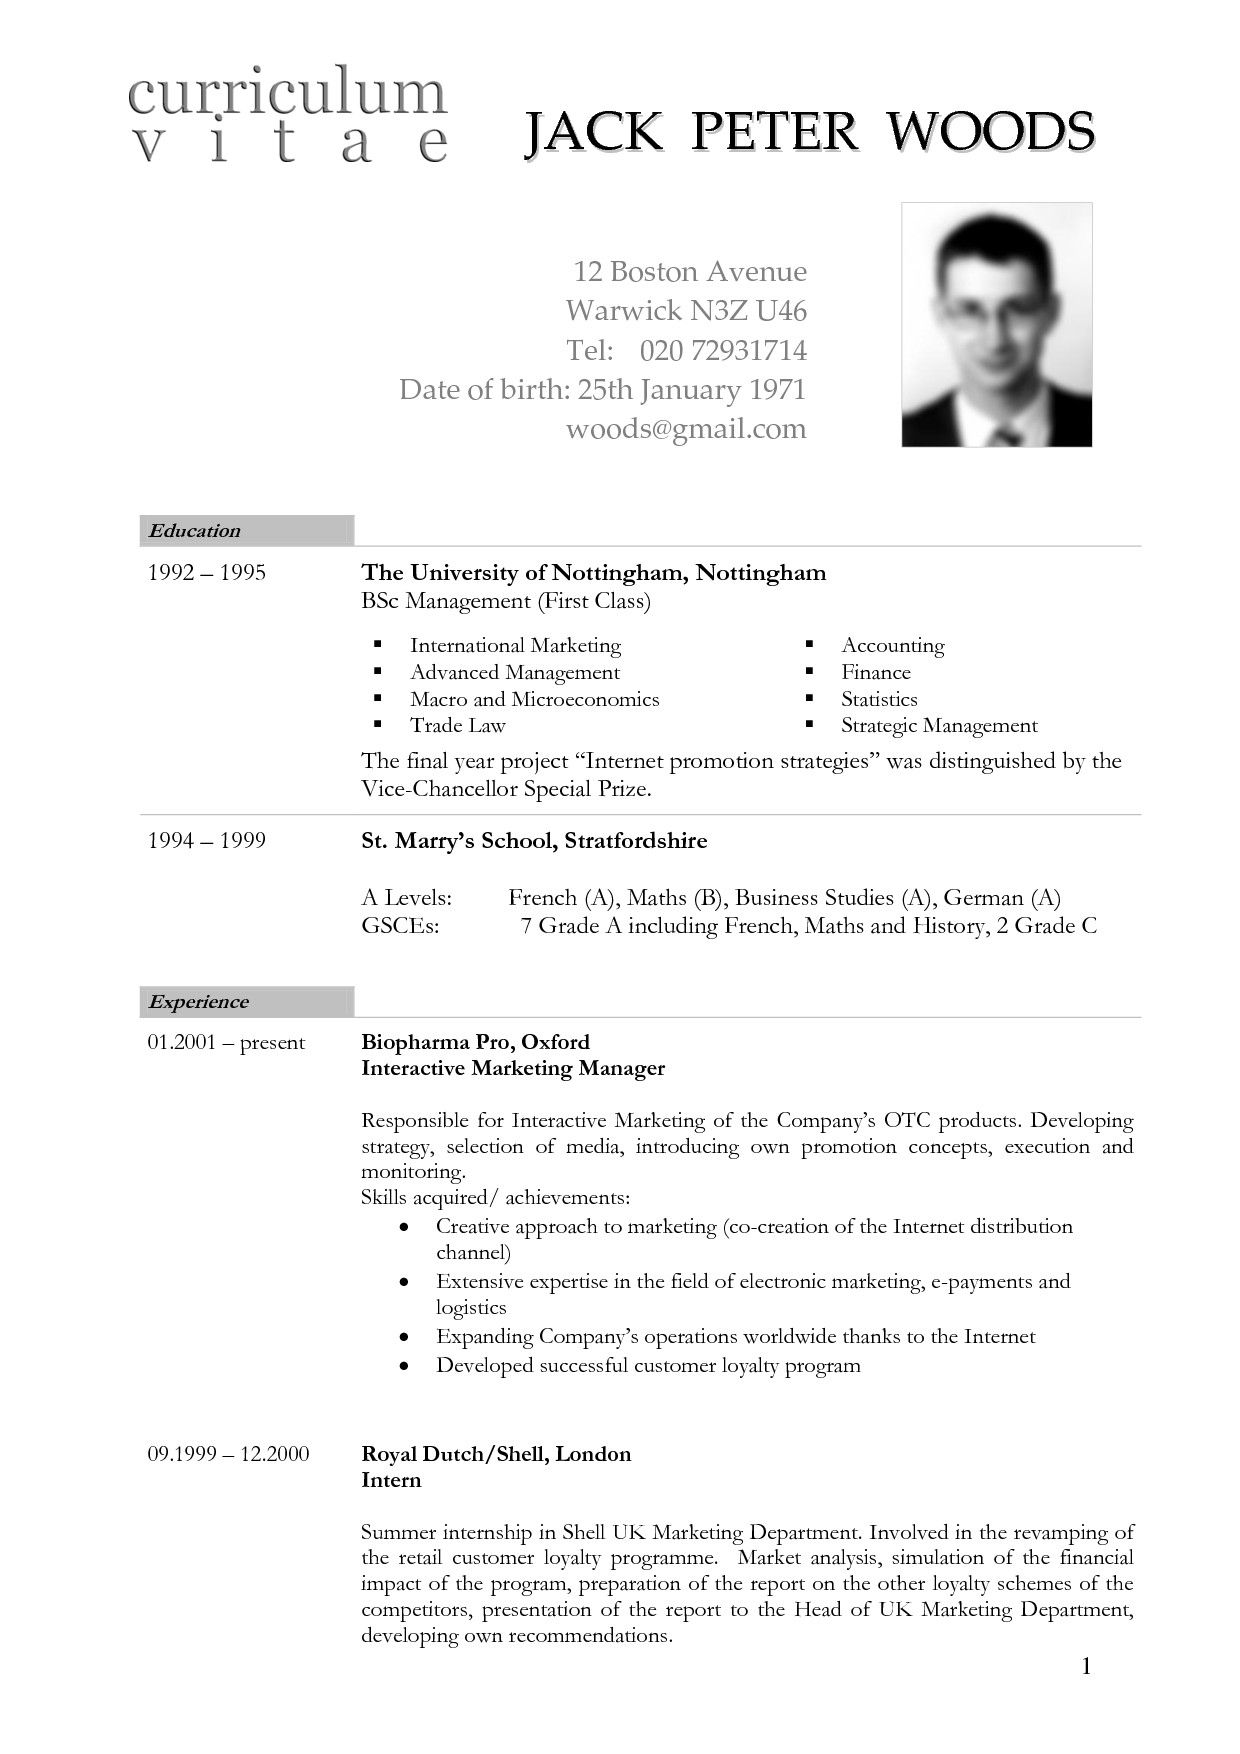 Cv Template Germany Resume Format Lebenslauf Lebenslauf Template Lebenslauf Beispiele